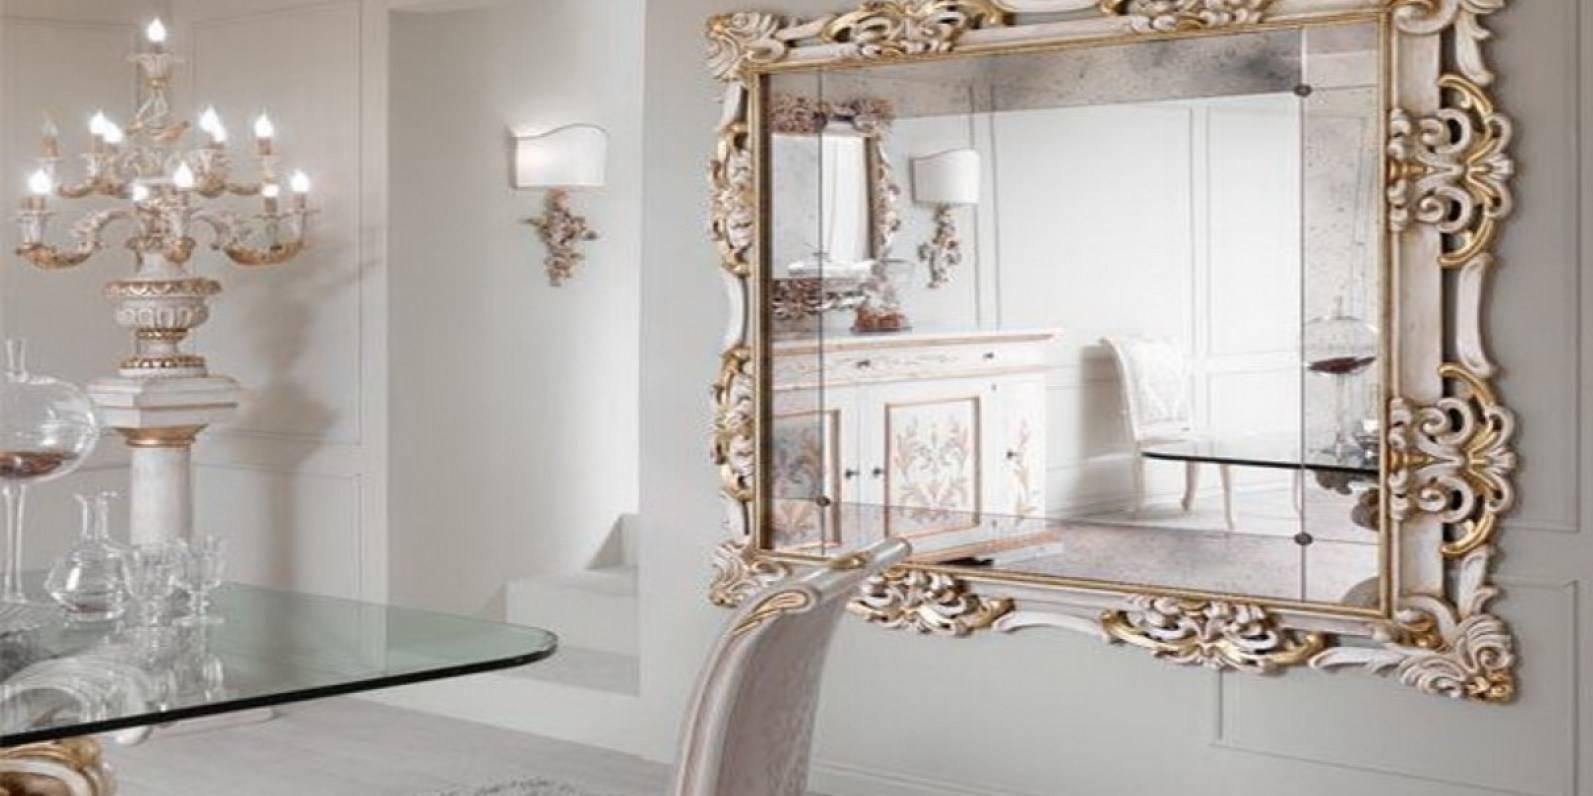 Mirror : Shabby Chic Mirrors Wonderful Large Black Ornate Mirror within Big Shabby Chic Mirrors (Image 12 of 15)